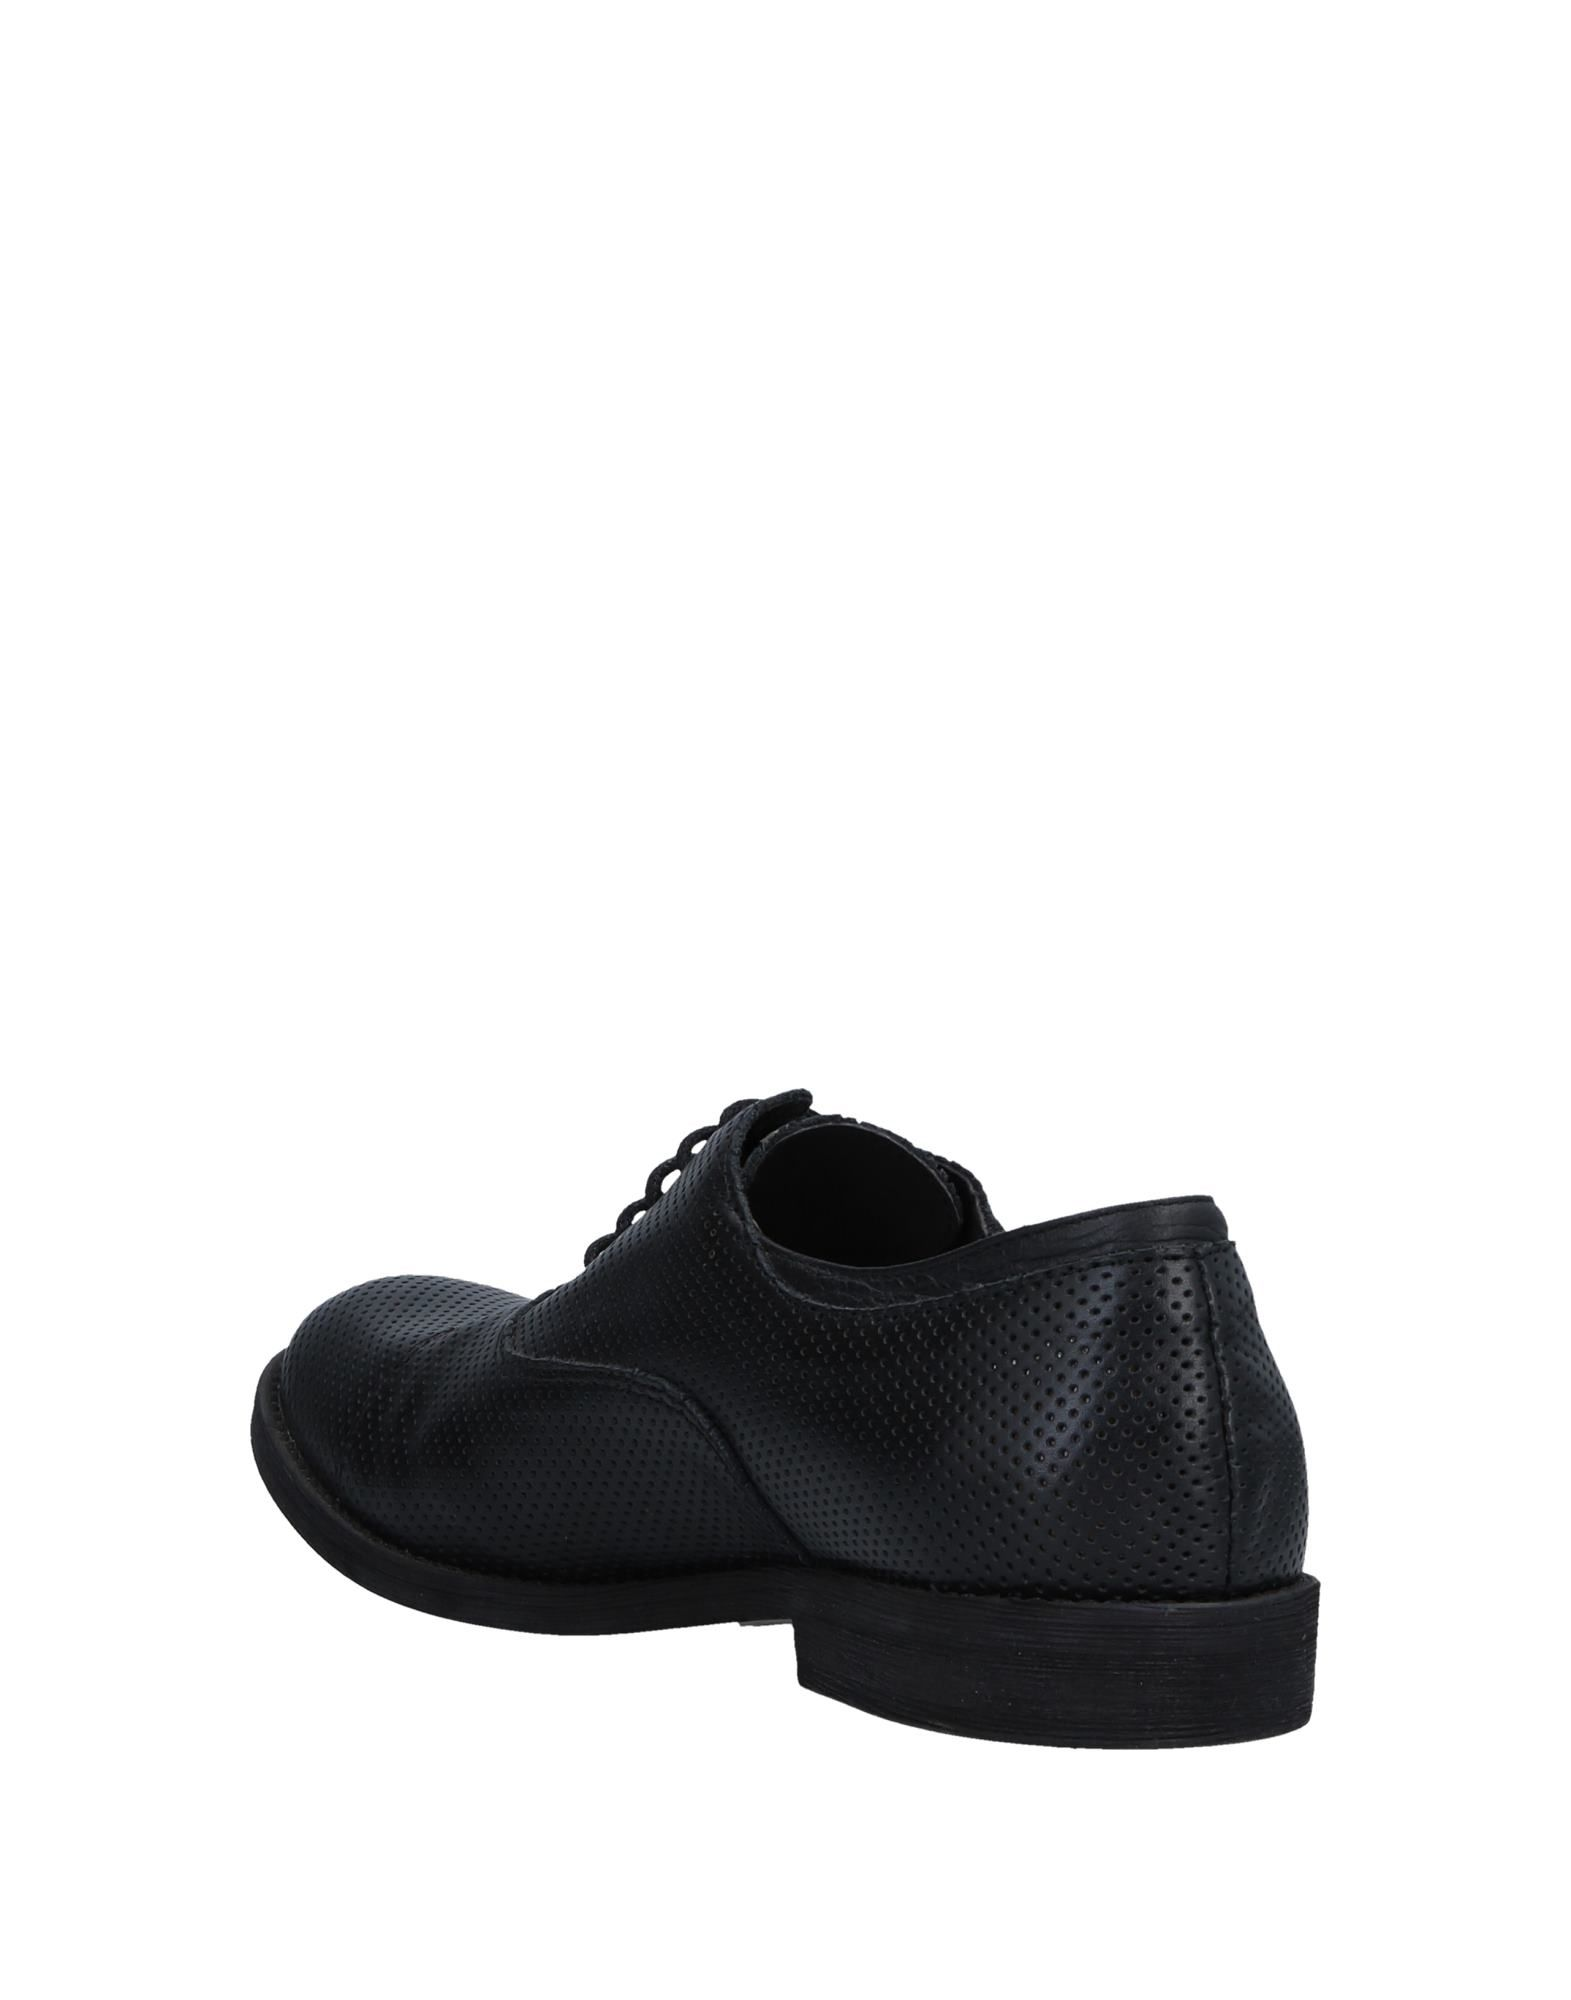 Rabatt echte Schuhe 36 Officina 36 Schuhe Schnürschuhe Herren  11540346JD 8c1876